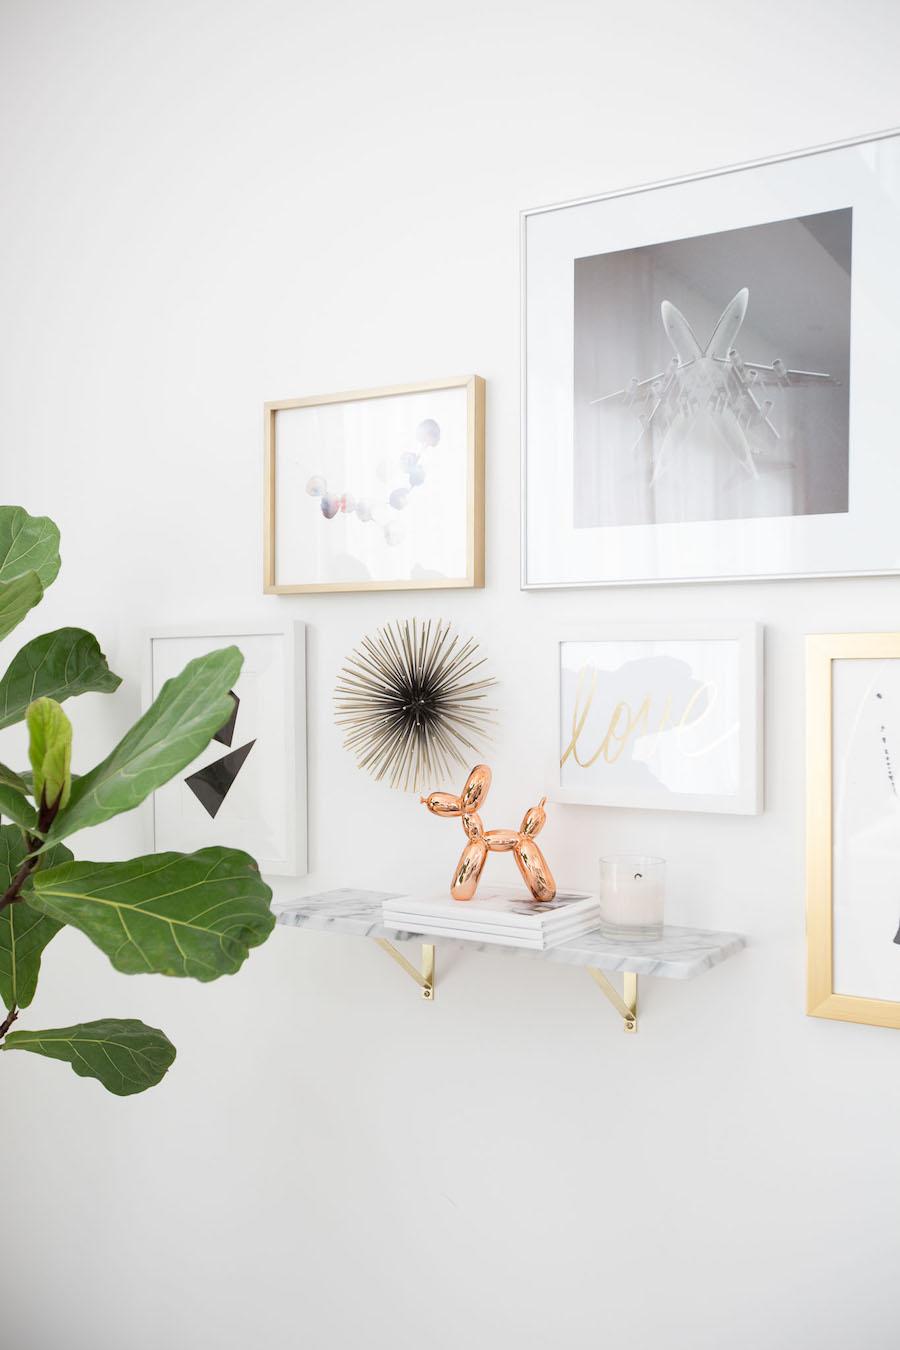 Mini Koons balloon dog on gallery wall